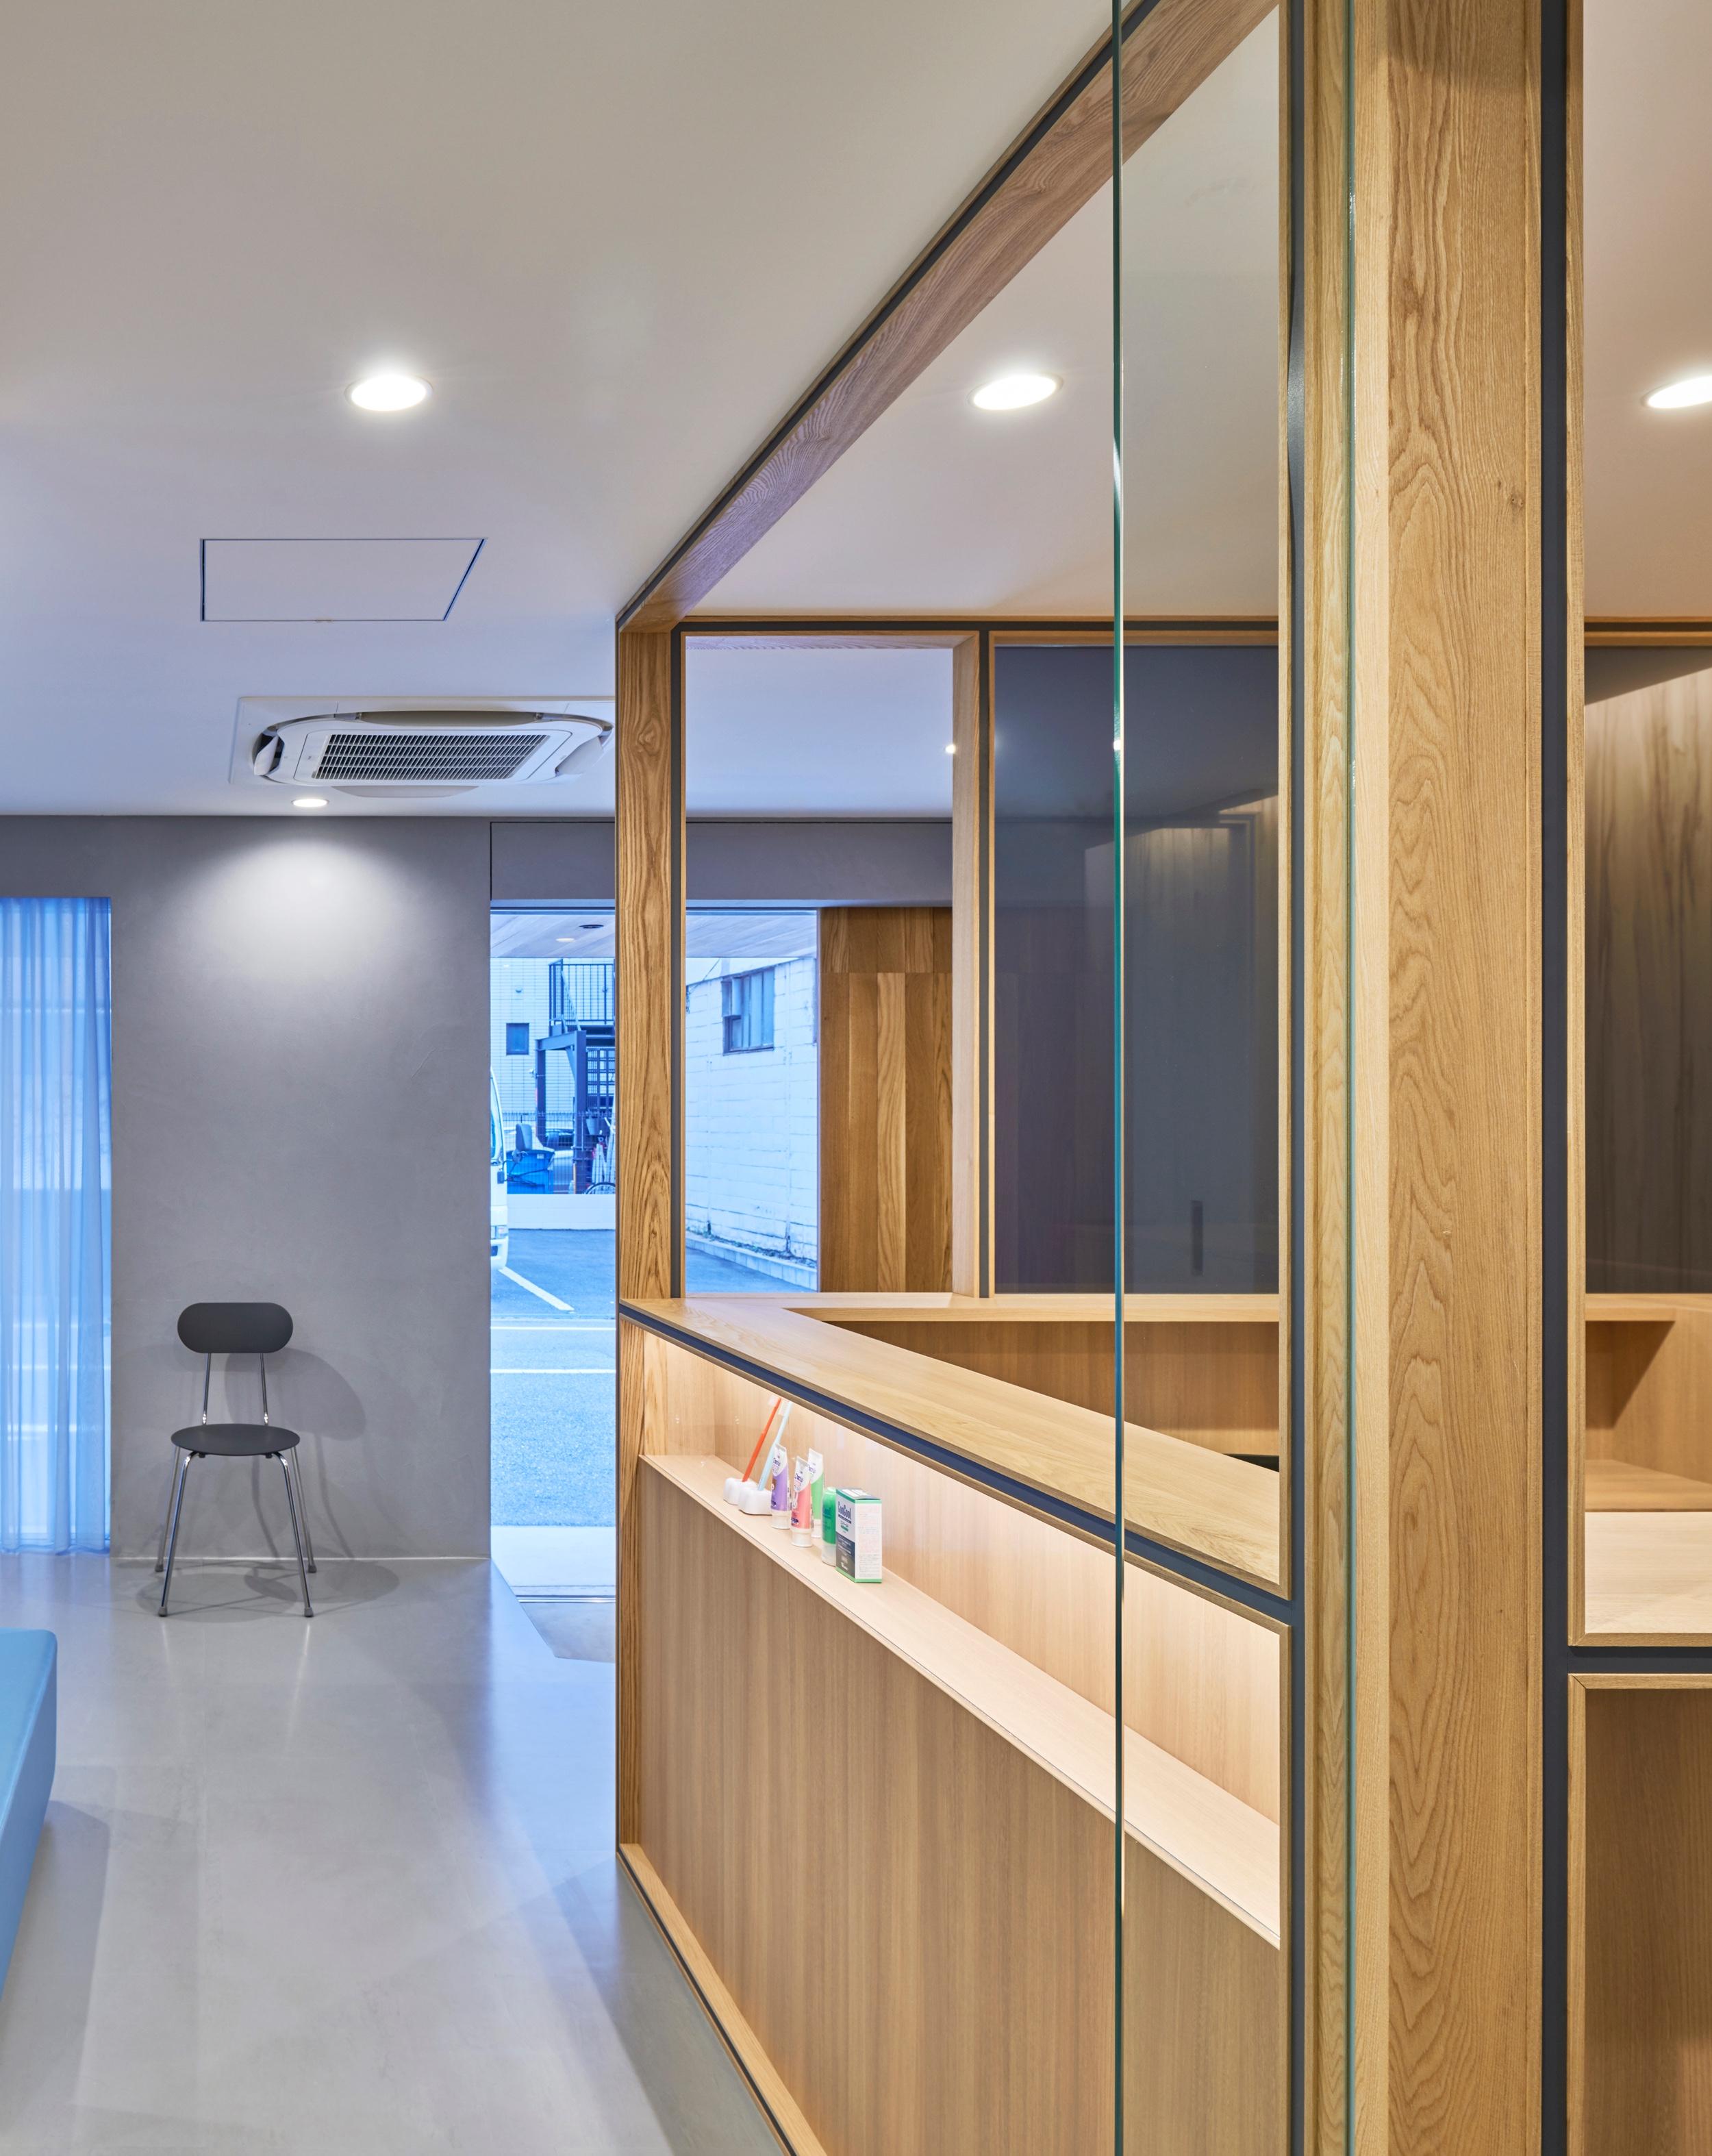 Kimura Dental Clinic 14s ©Takeshi Asano 2019